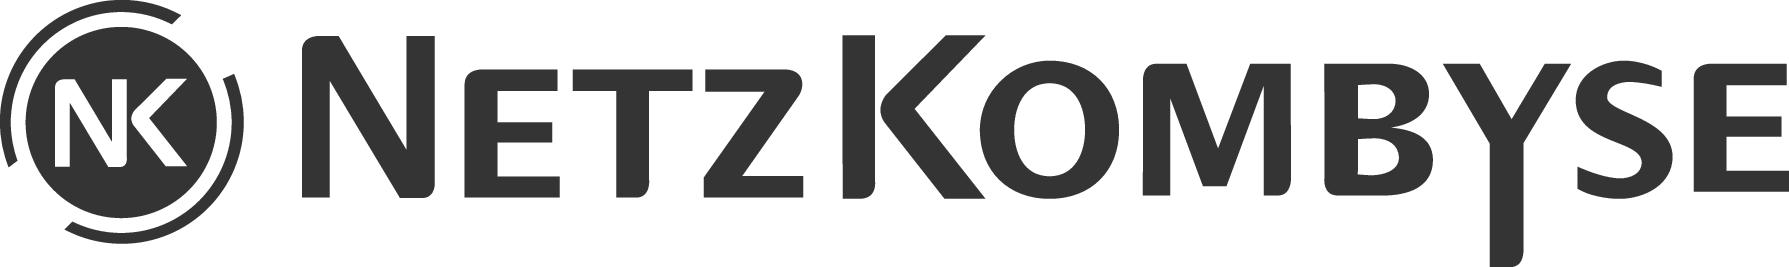 Netzkombyse logo